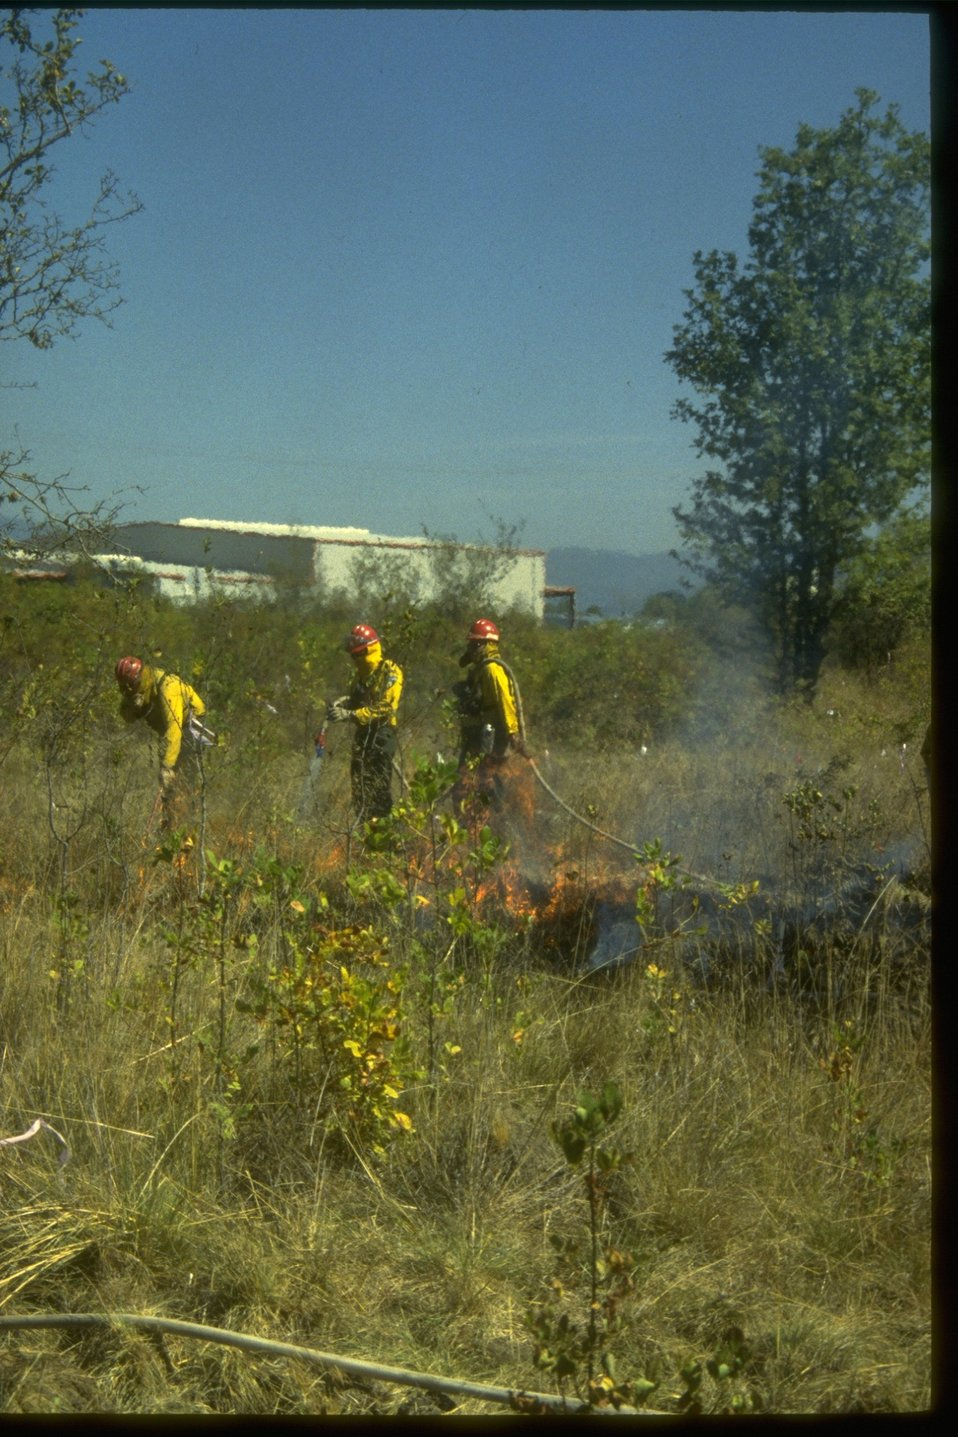 Prescribed burning at Wetlands.